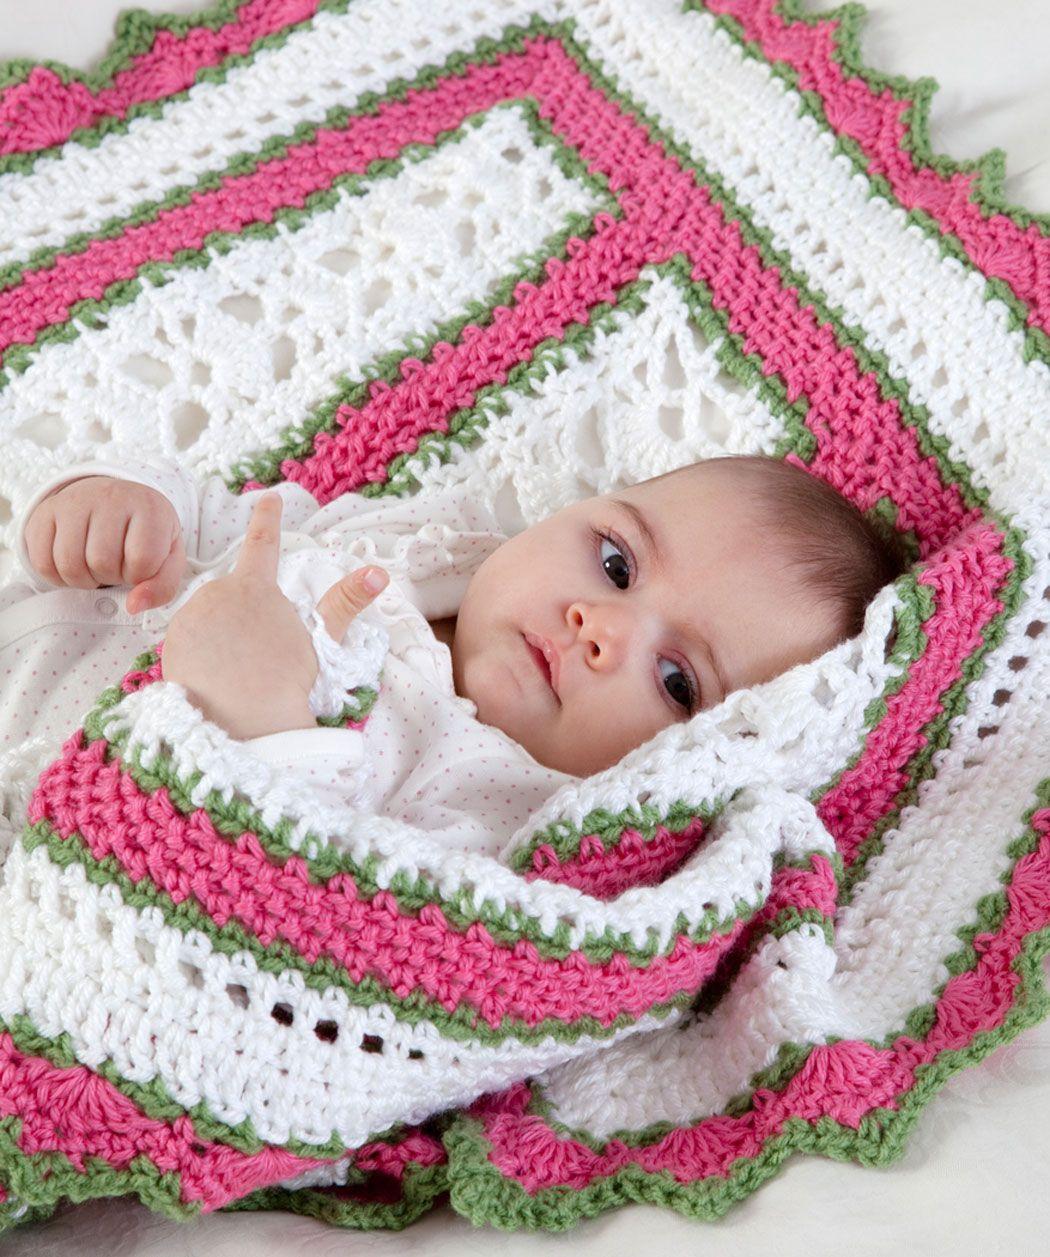 Sweet Baby Blanket: free pattern